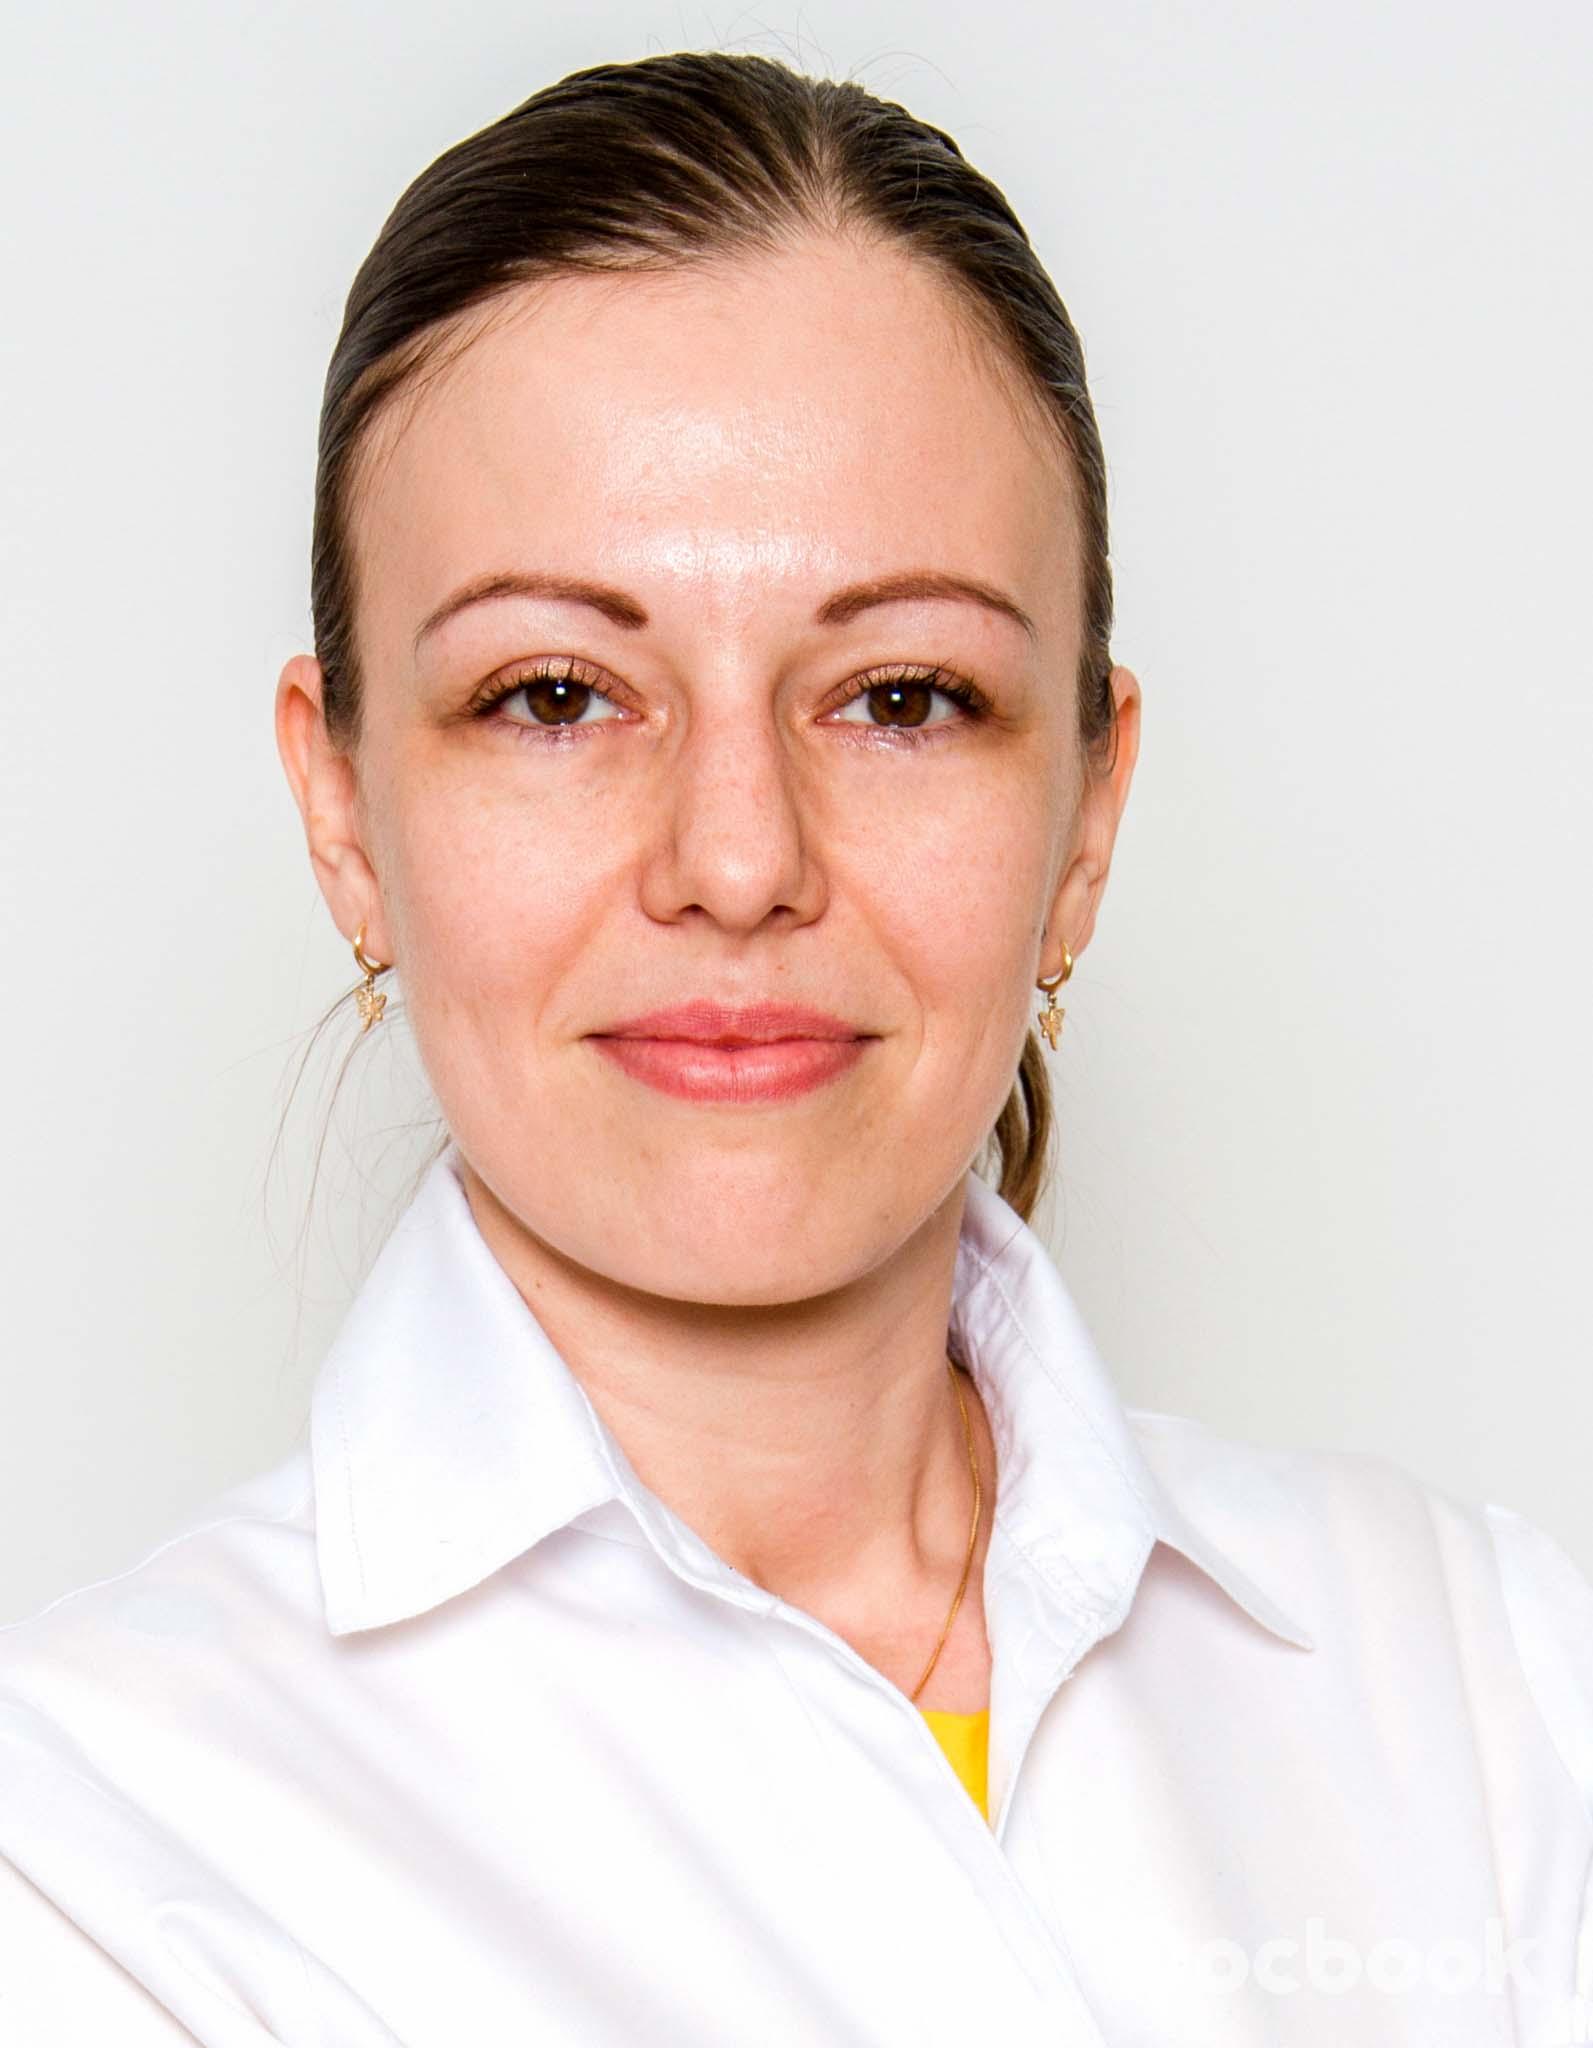 Dr. Mihaela Lebedenco